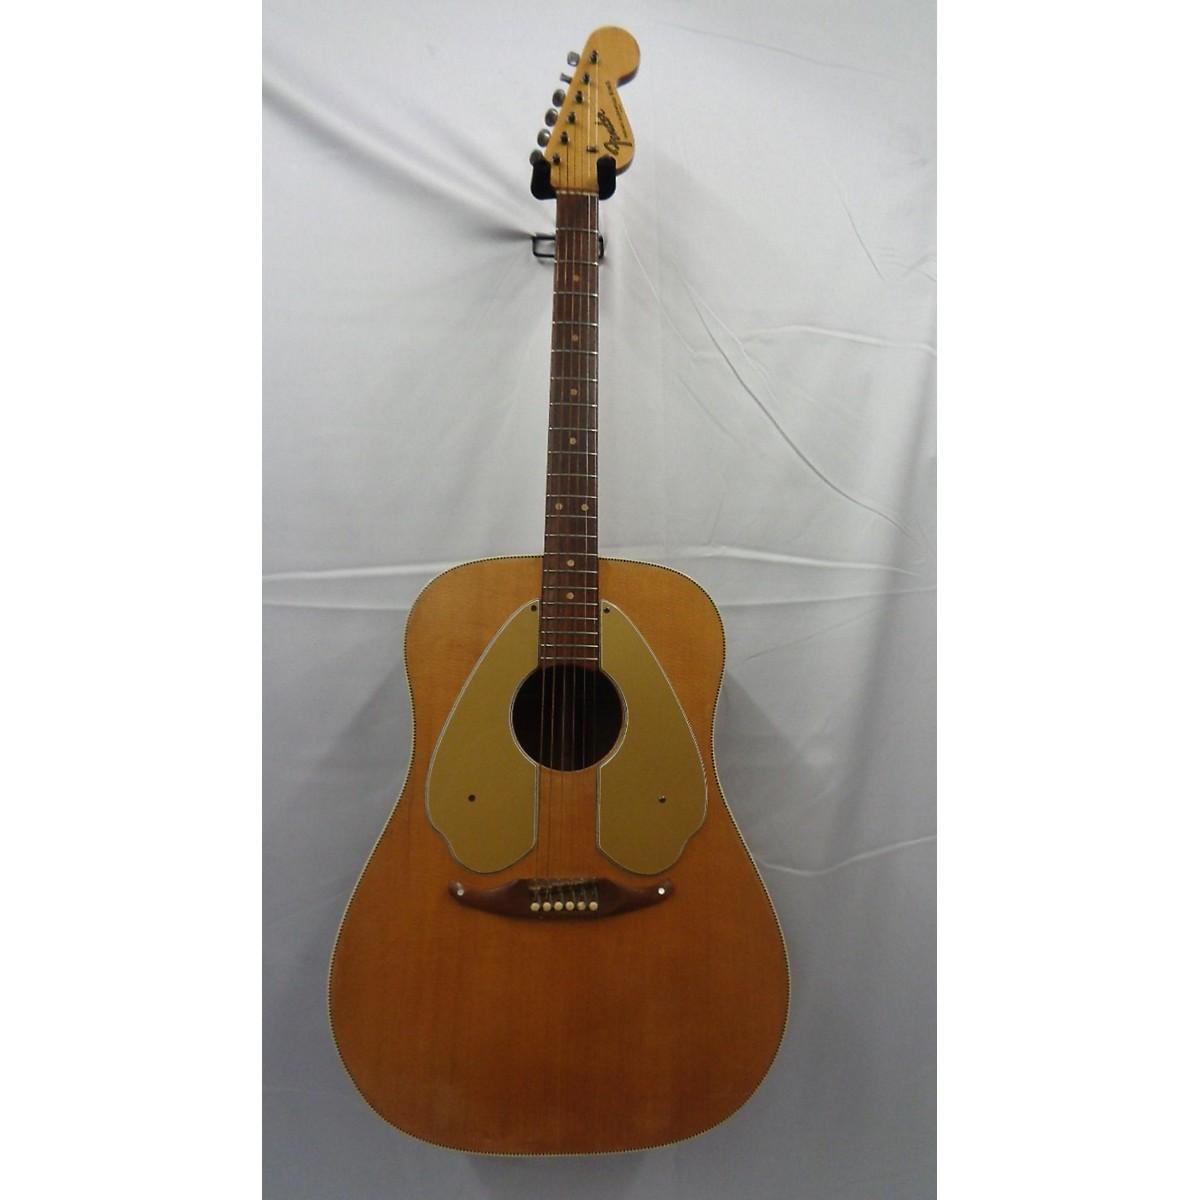 Fender 1960s King Indian Rosewood Acoustic Guitar